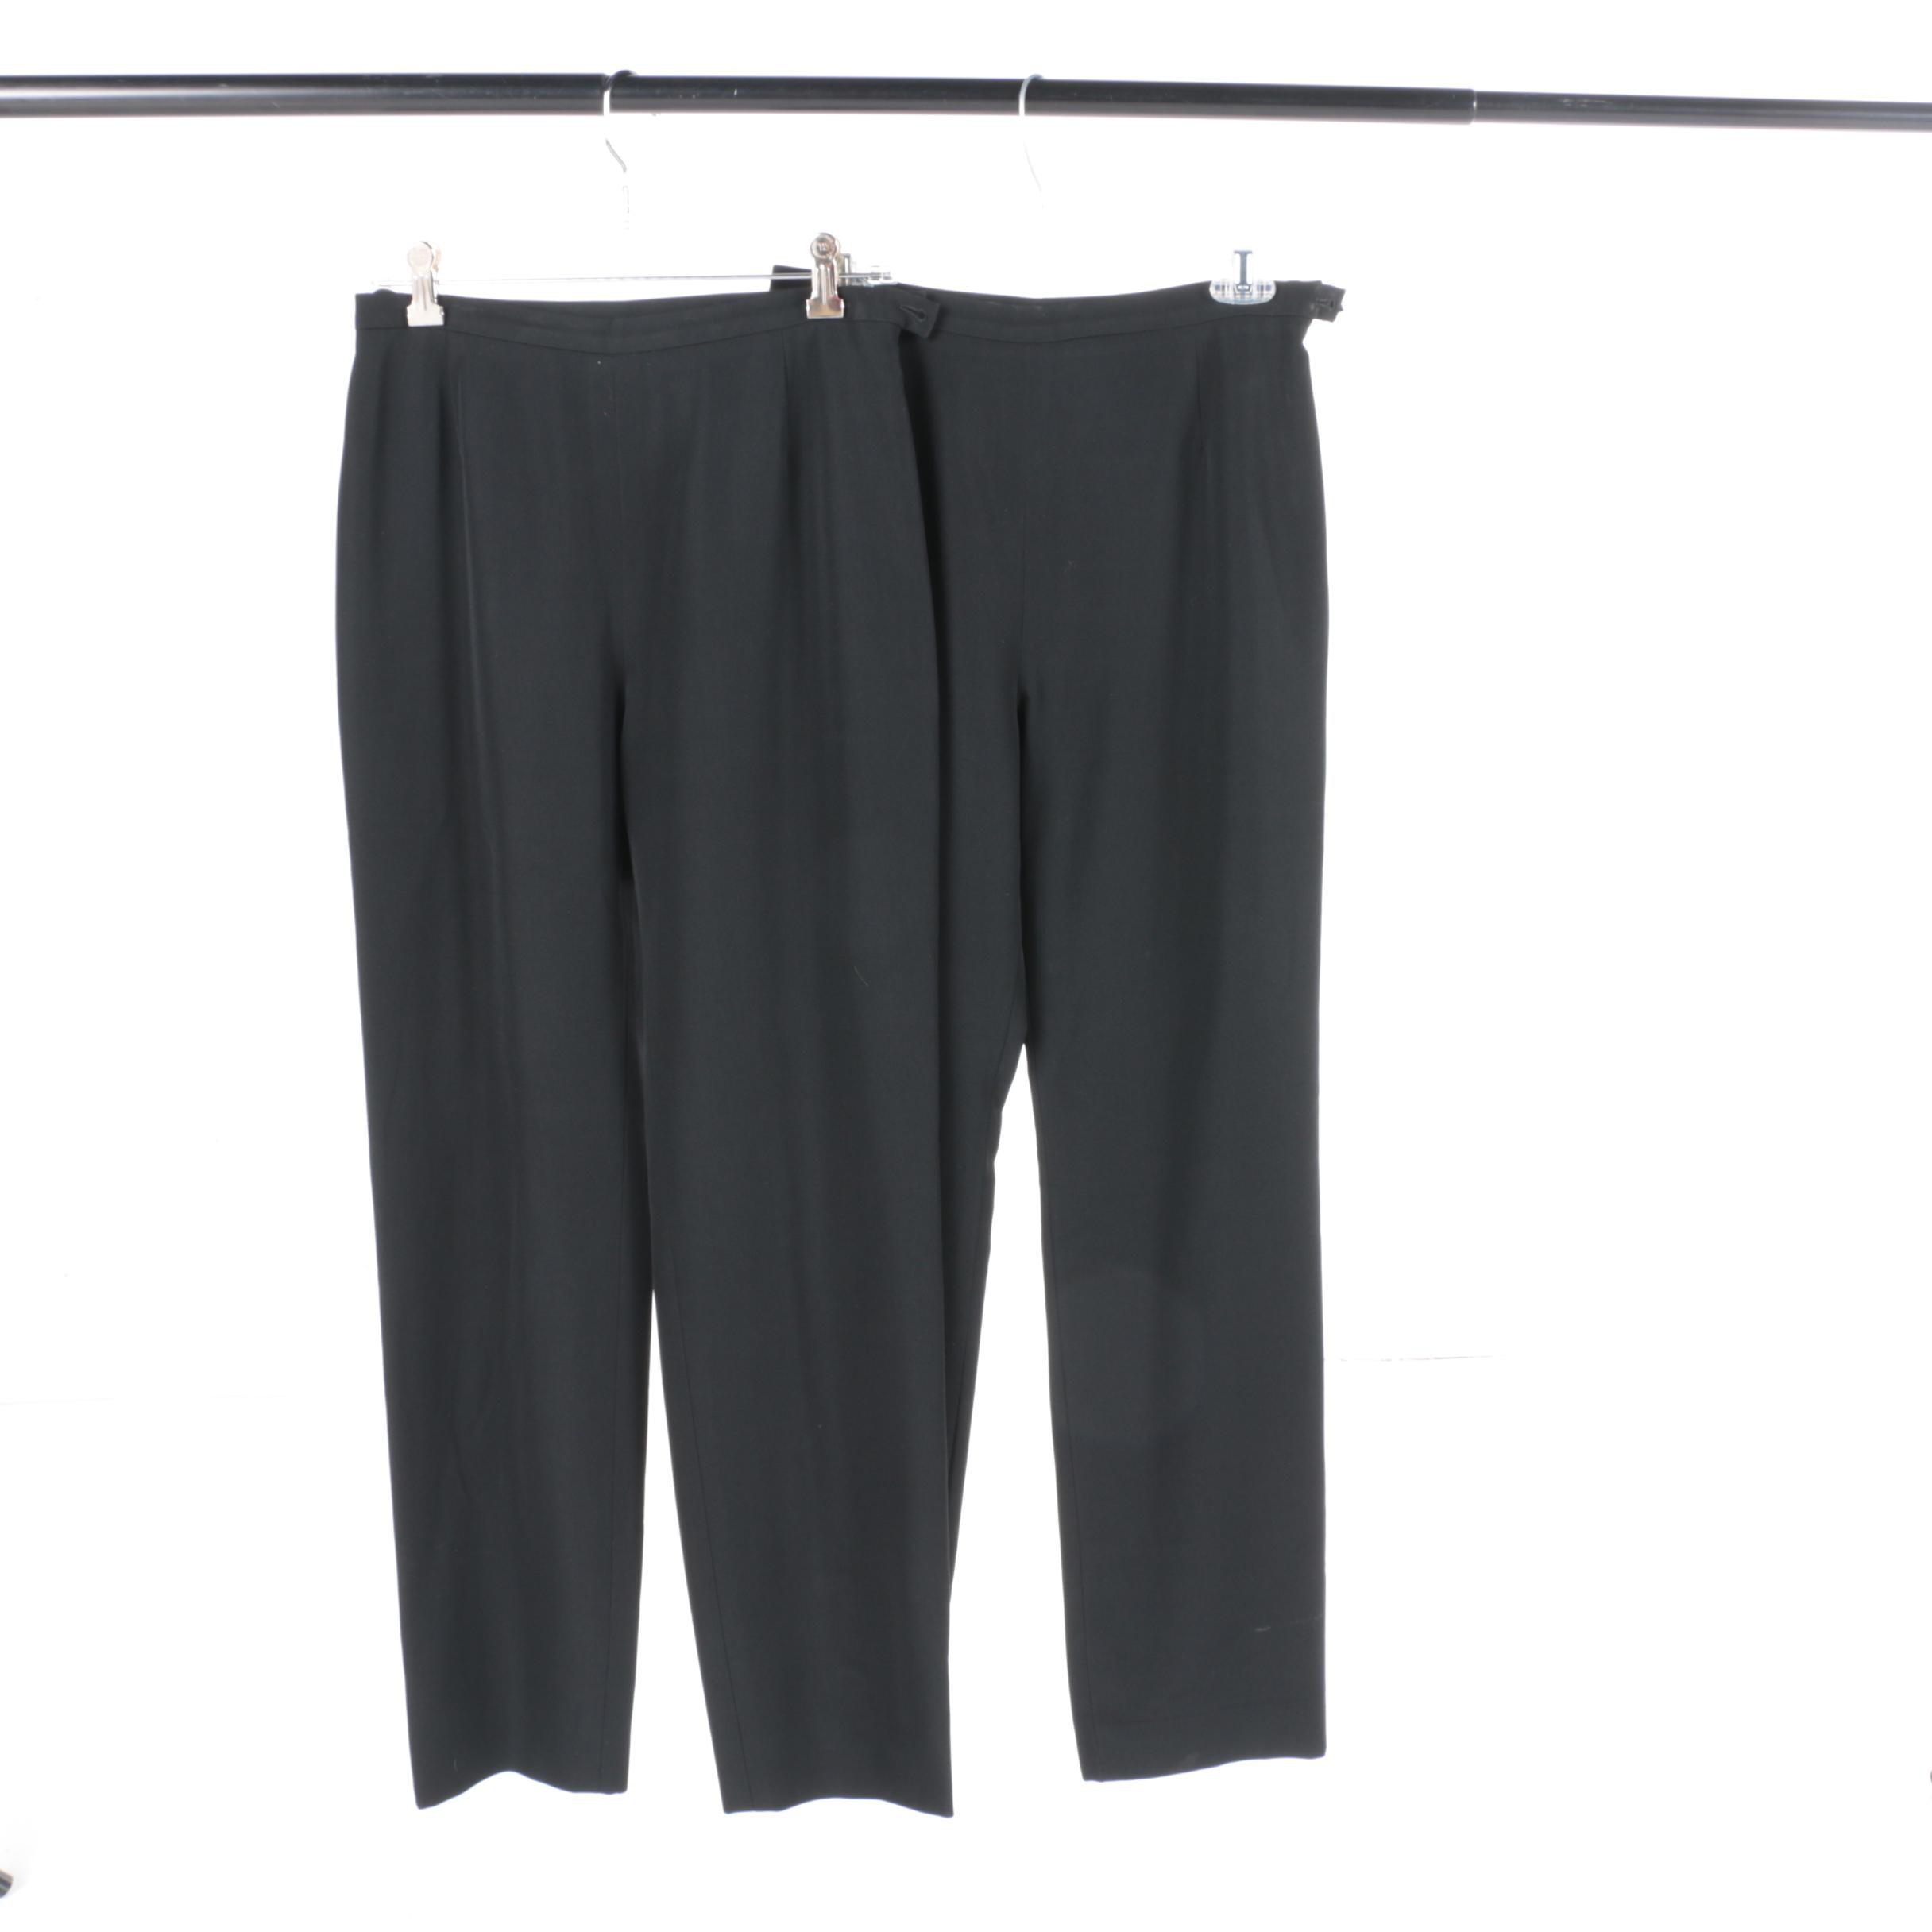 Chanel Black Wool Pants